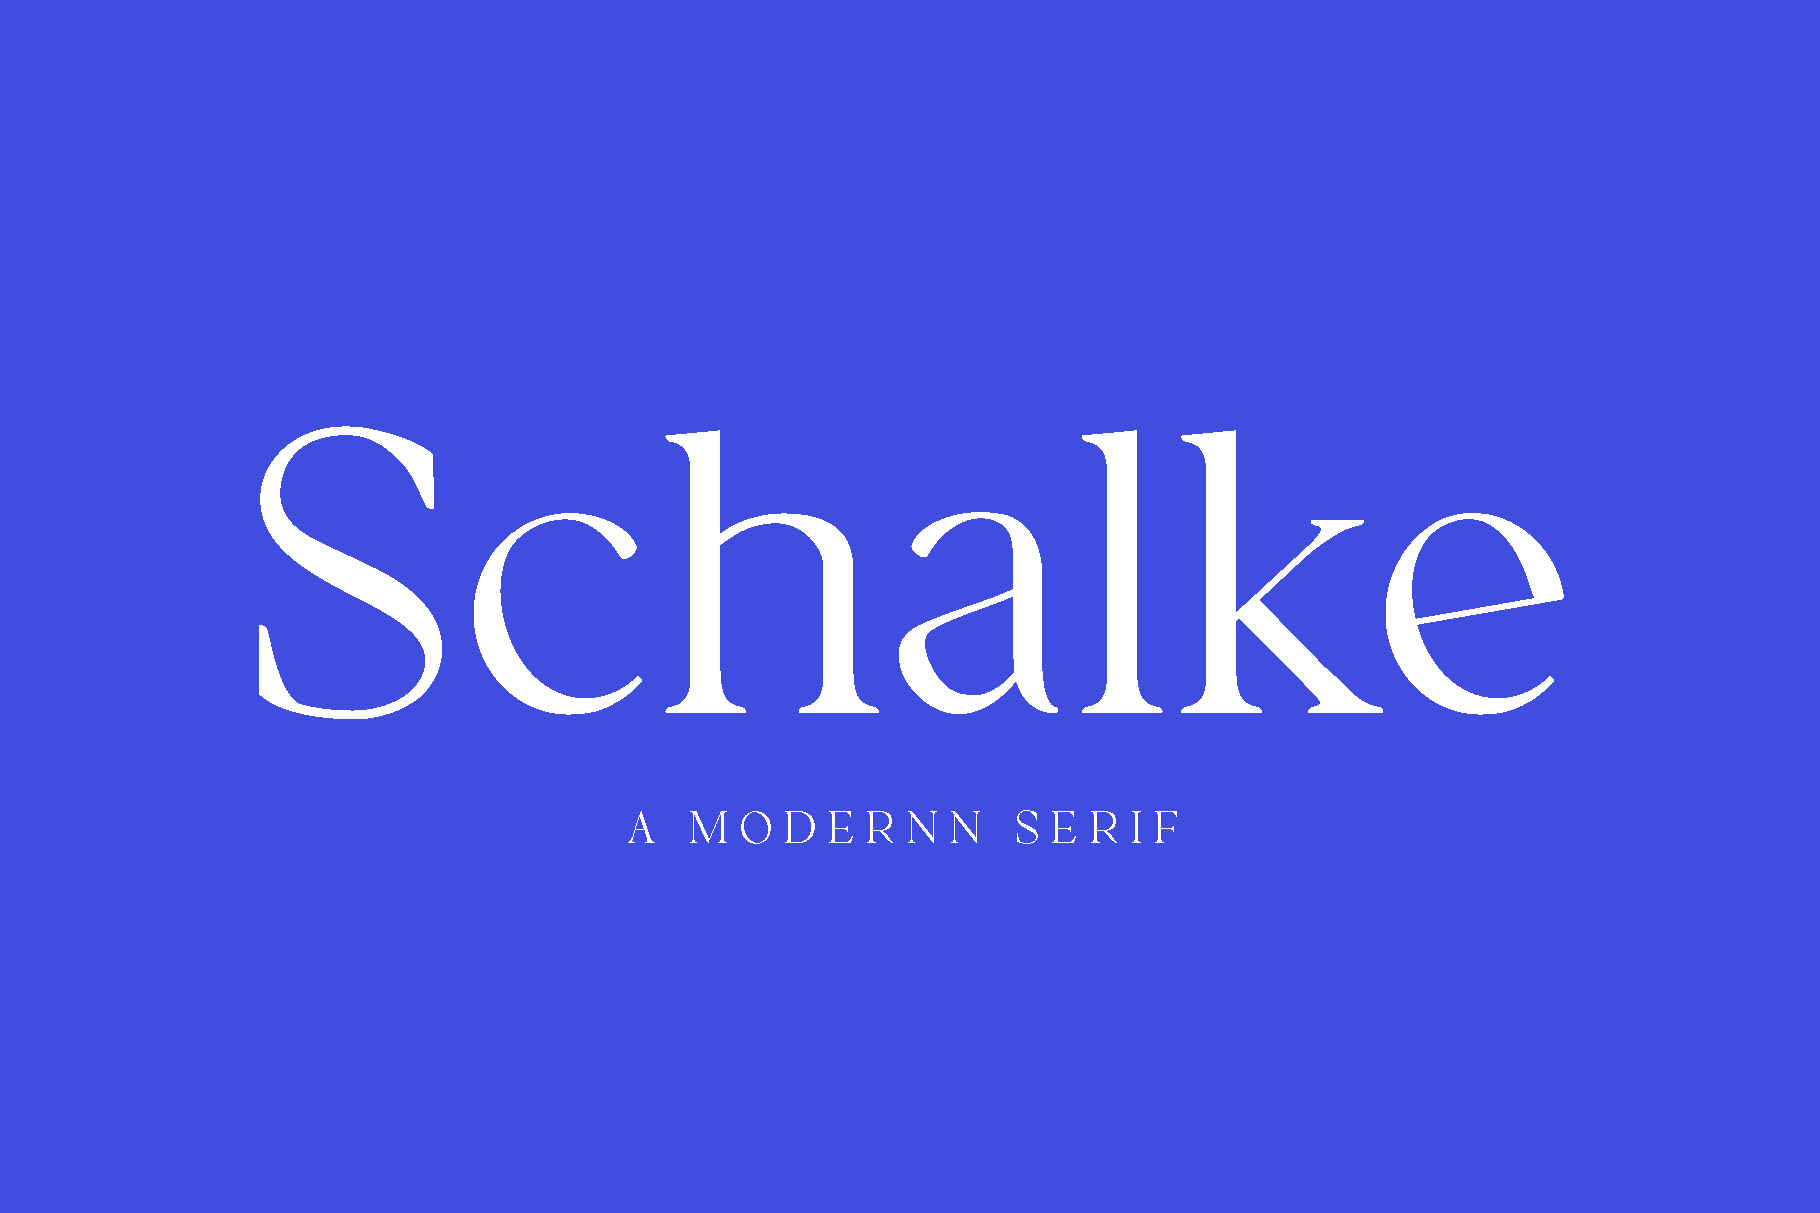 Schalke - Modernn Serif example image 1